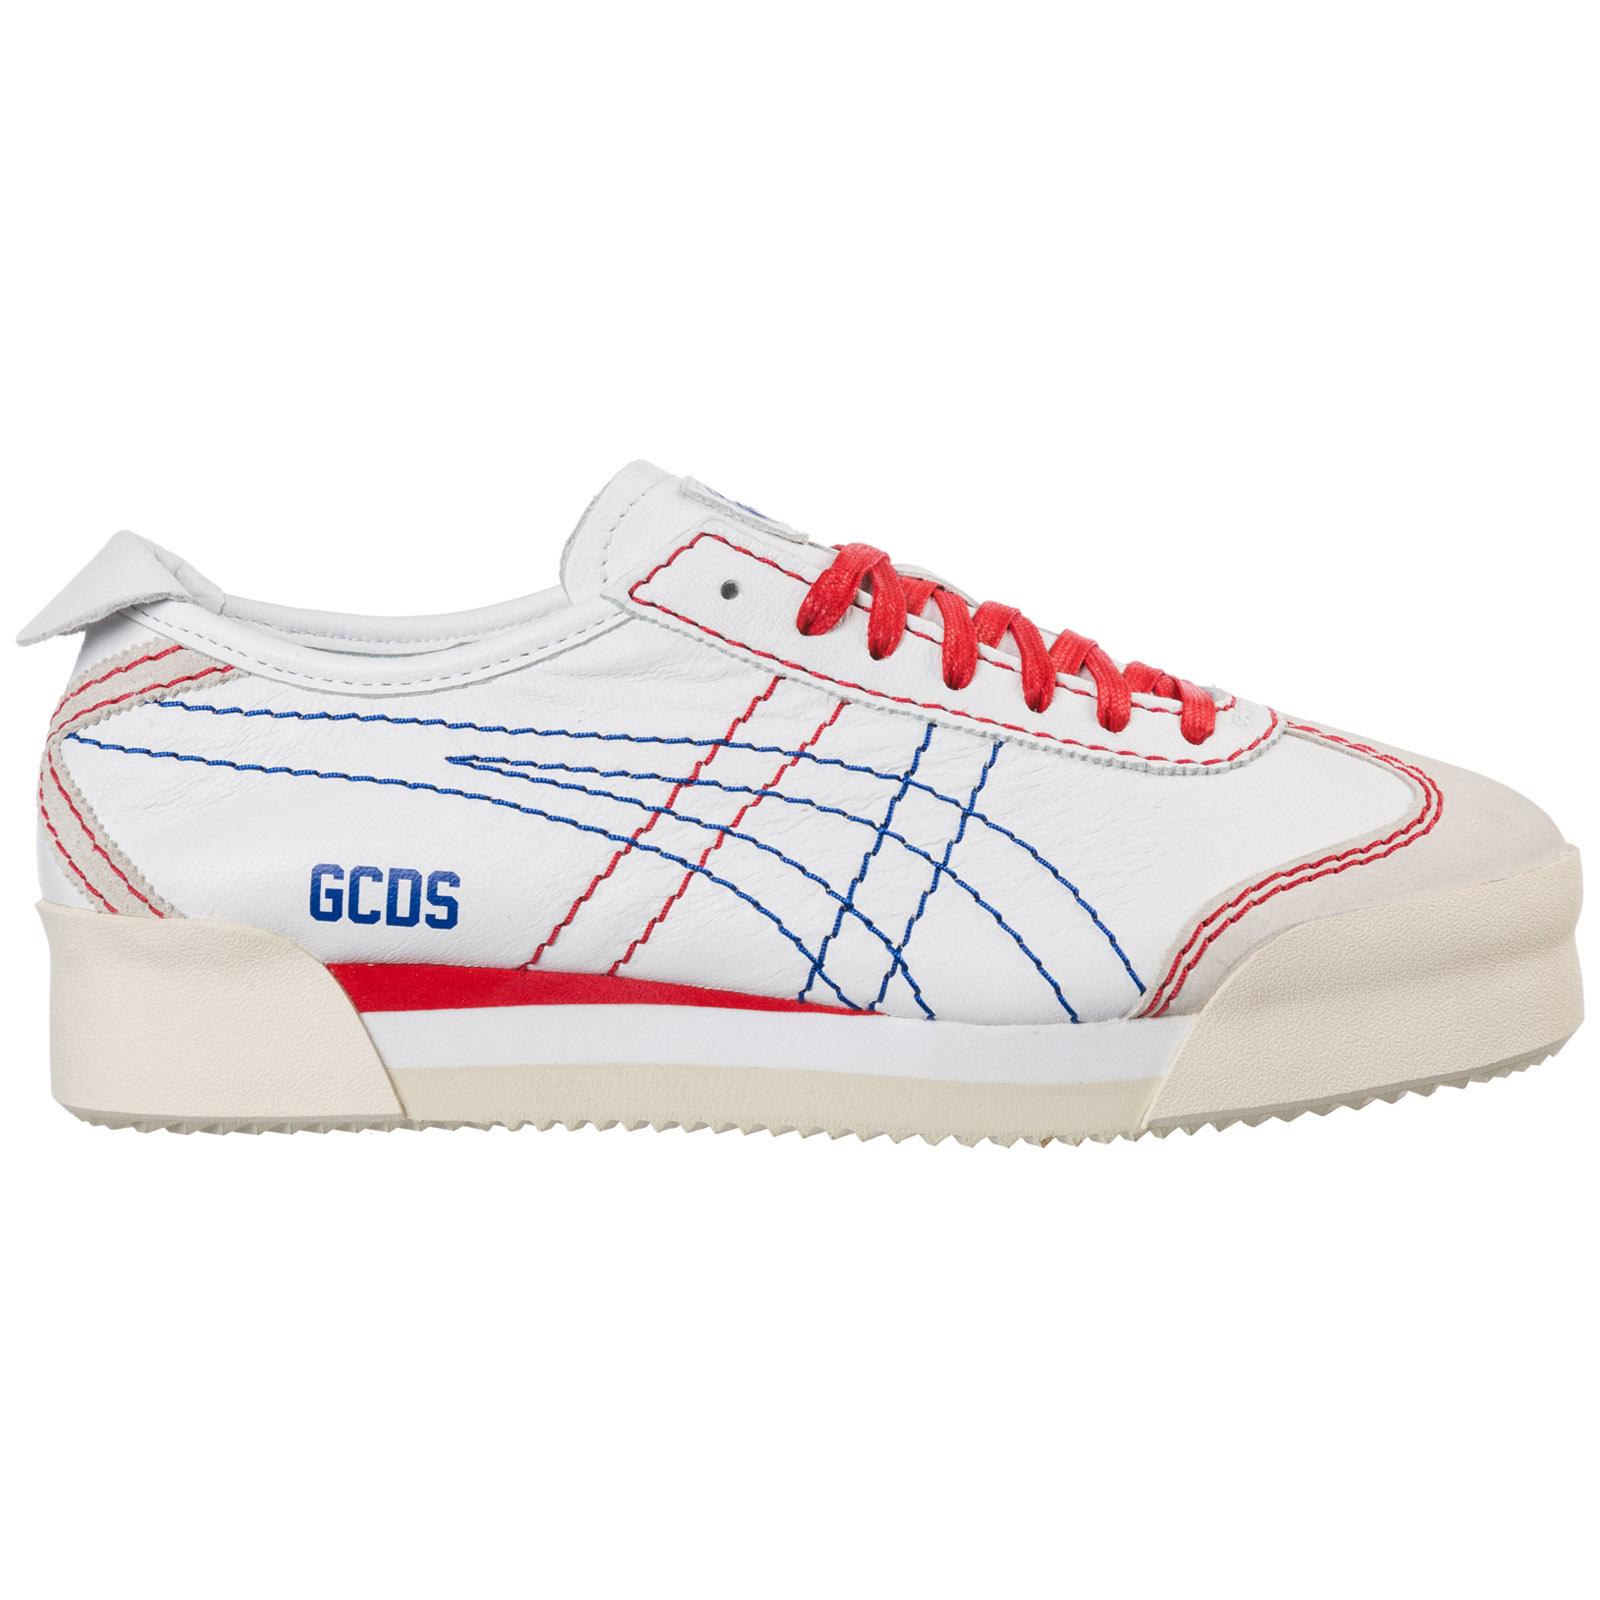 welding saw Dialogue  Sneakers GCDS onitsuka tiger mexico ot19m010001-01 bianco | FRMODA.com